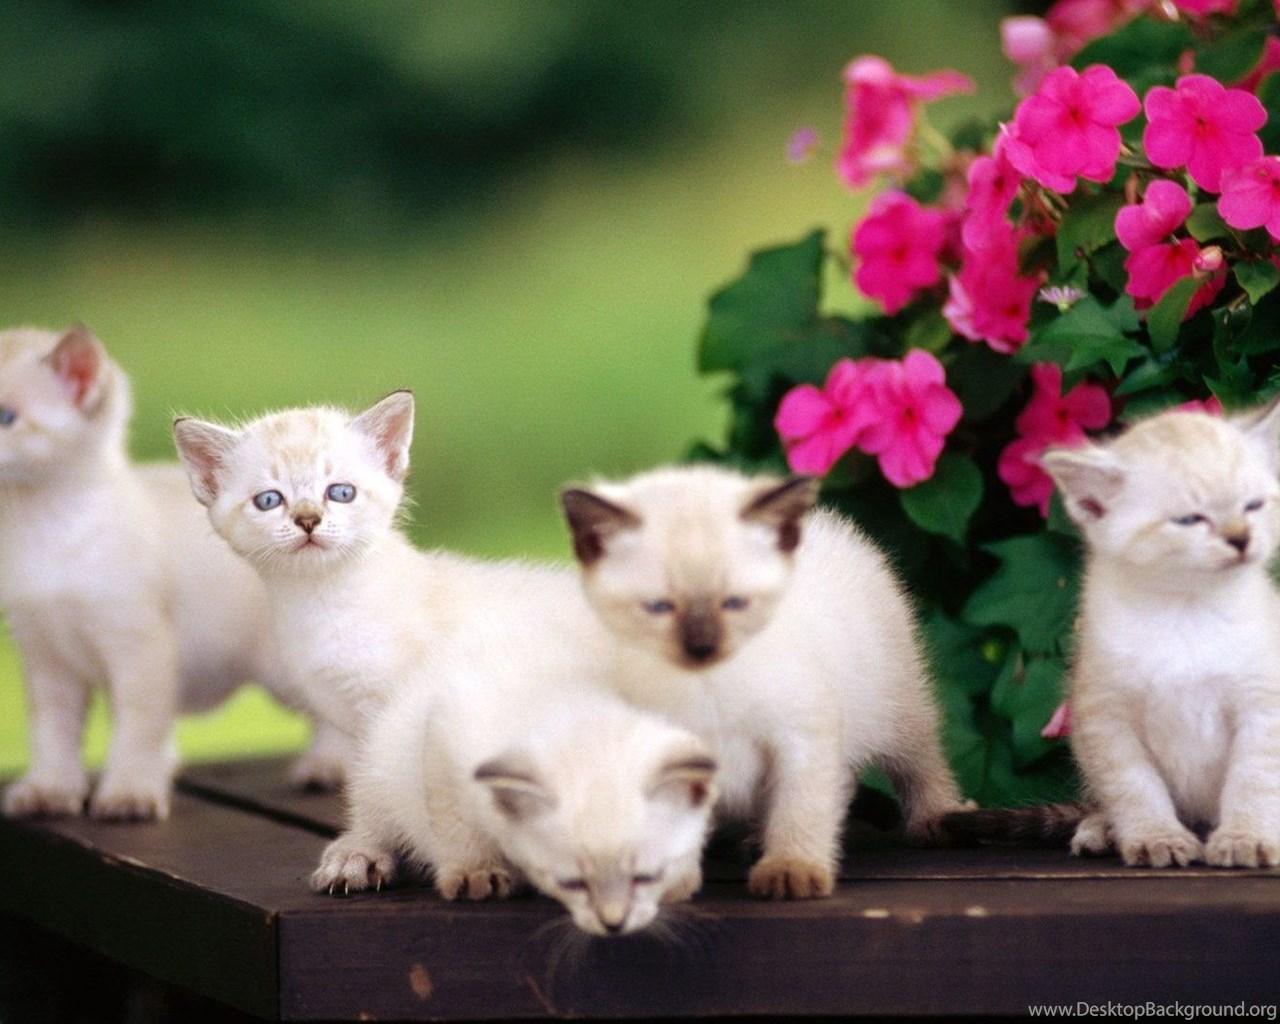 Wallpaper Cute Babies Hd Wallpapers: Cute Baby Animal Hd Wallpapers Desktop Background